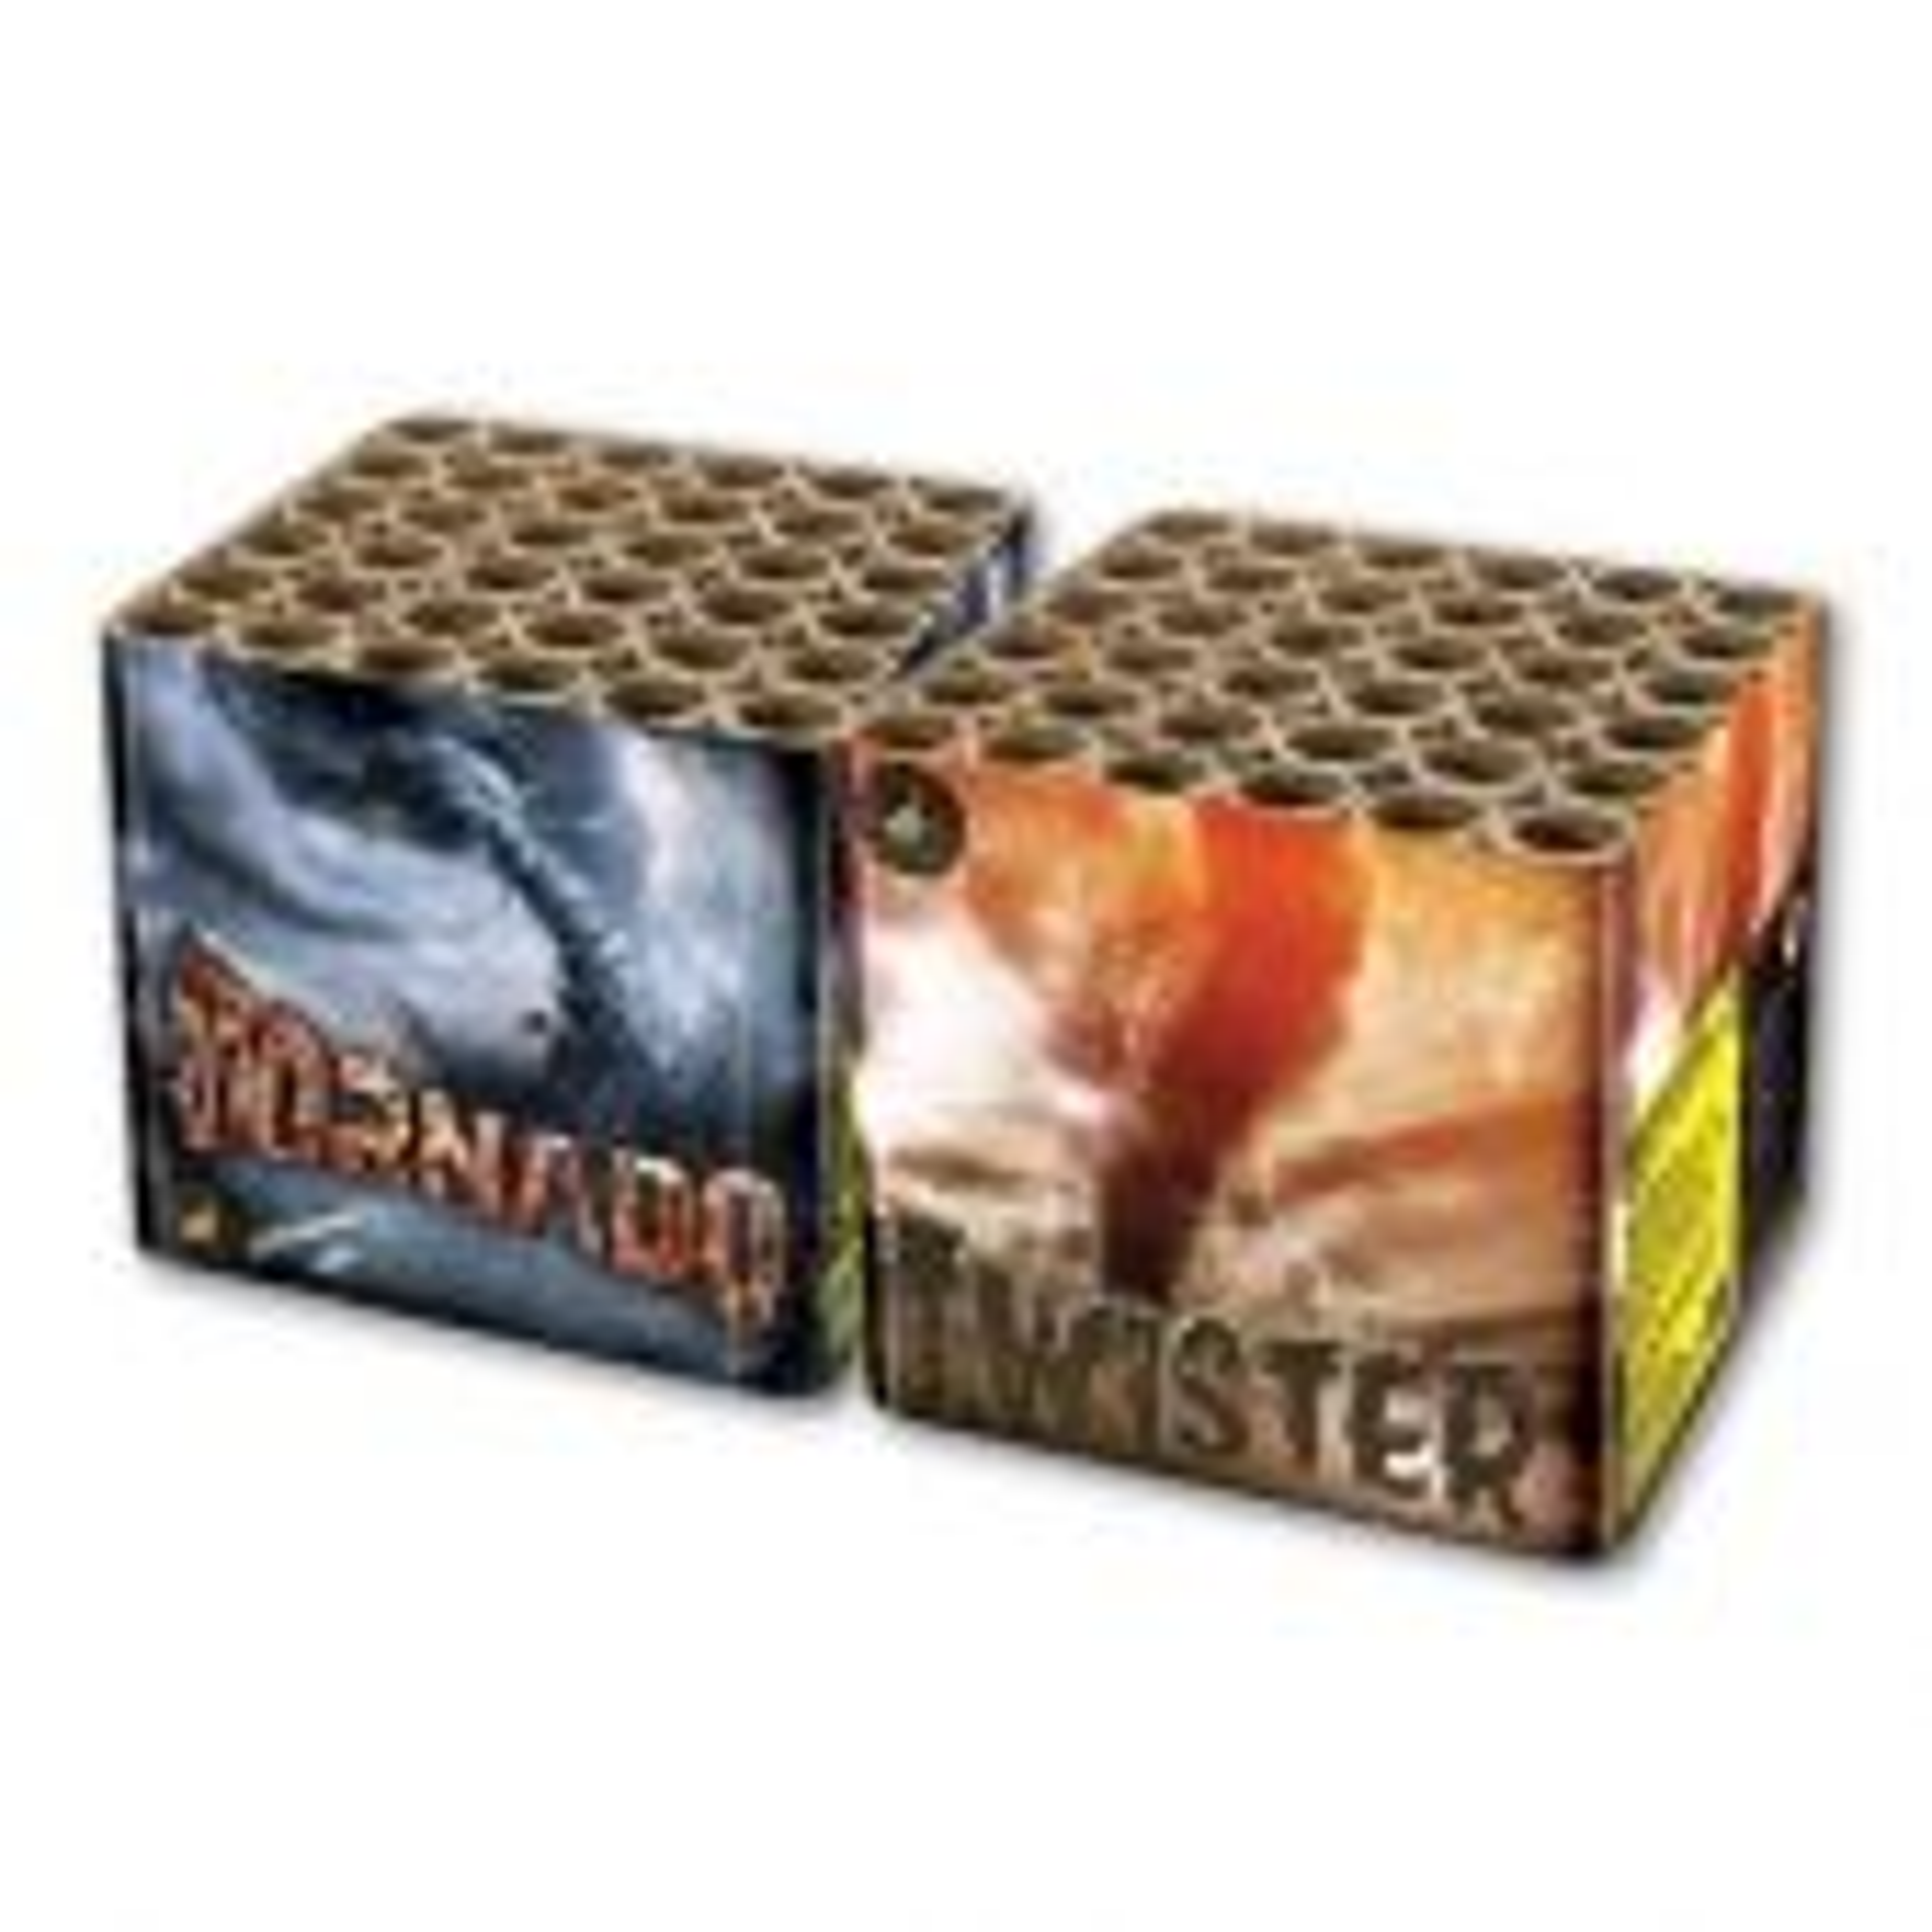 Firework Bundle - Tornado & Twister - BUY TORNADO GET TWISTER FREE